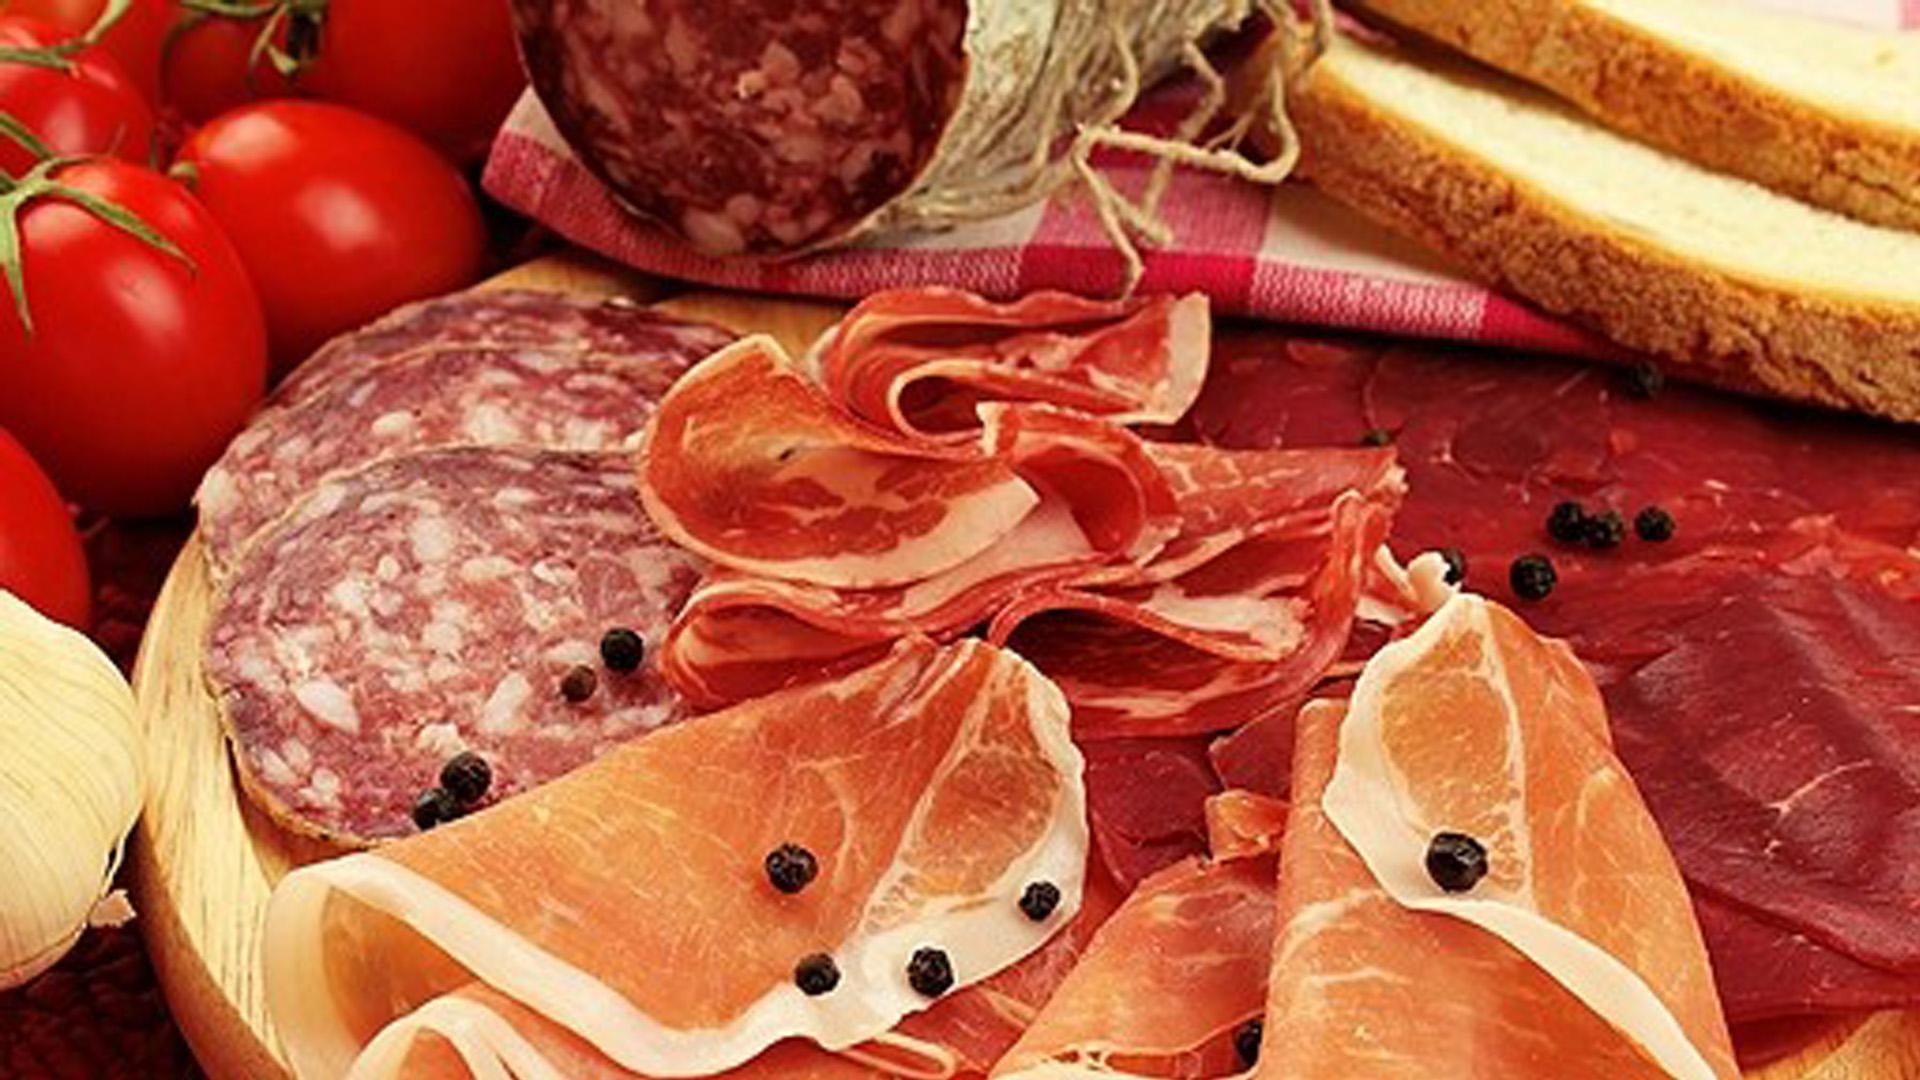 ontdekking_gastronomia